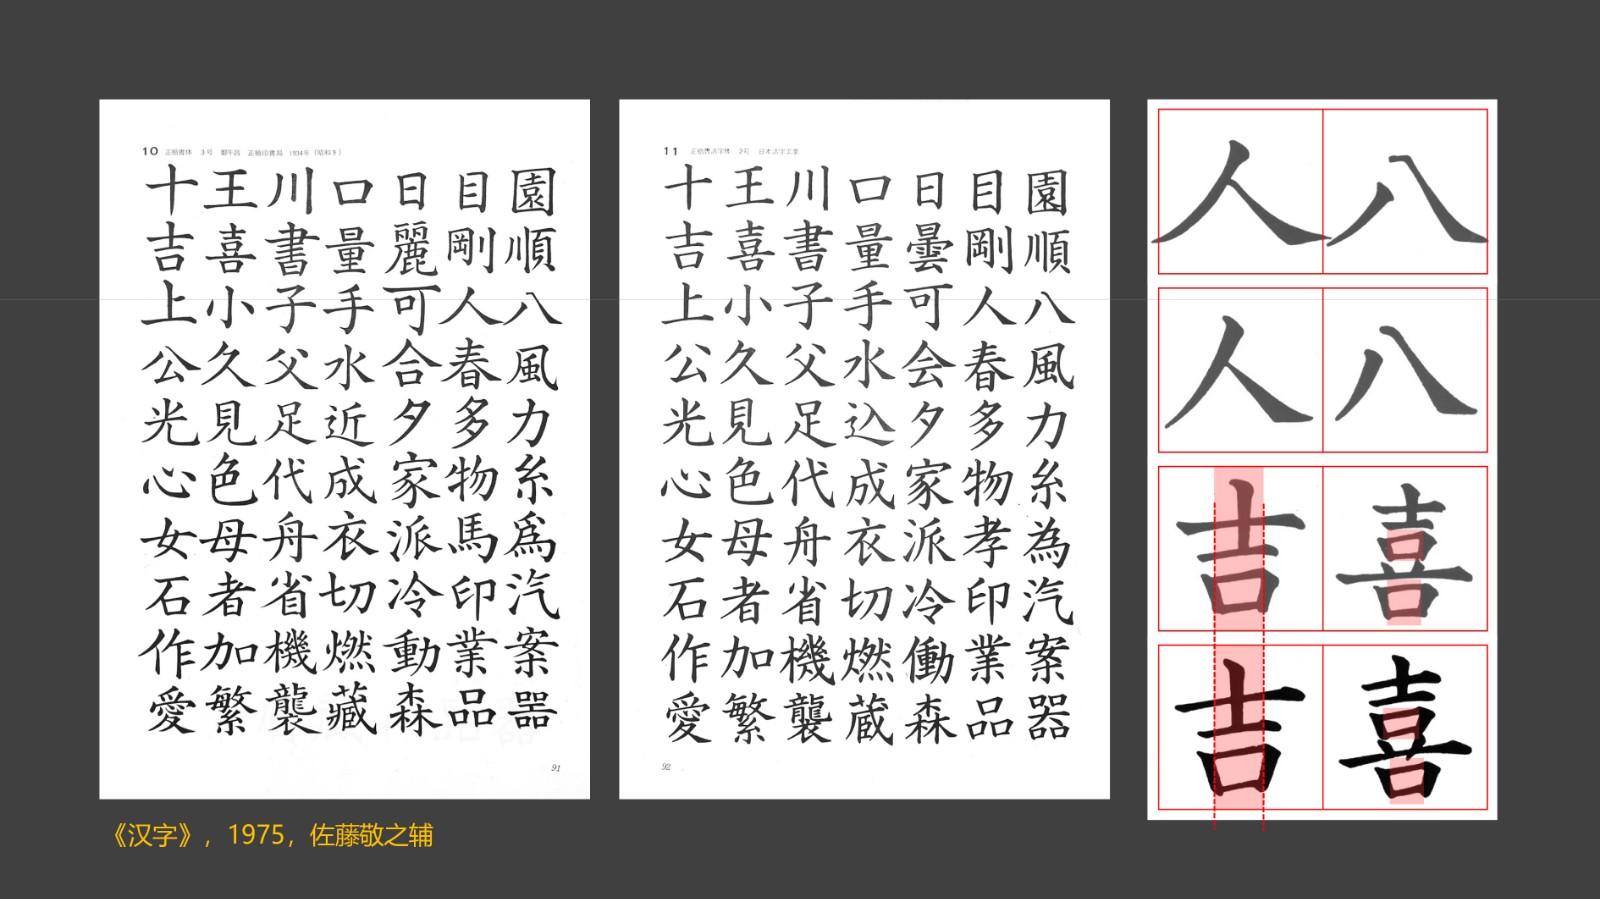 https://ft-bk1.oss-cn-zhangjiakou.aliyuncs.com/Public/Uploads/img/n_content_20201210104528_8944.jpg